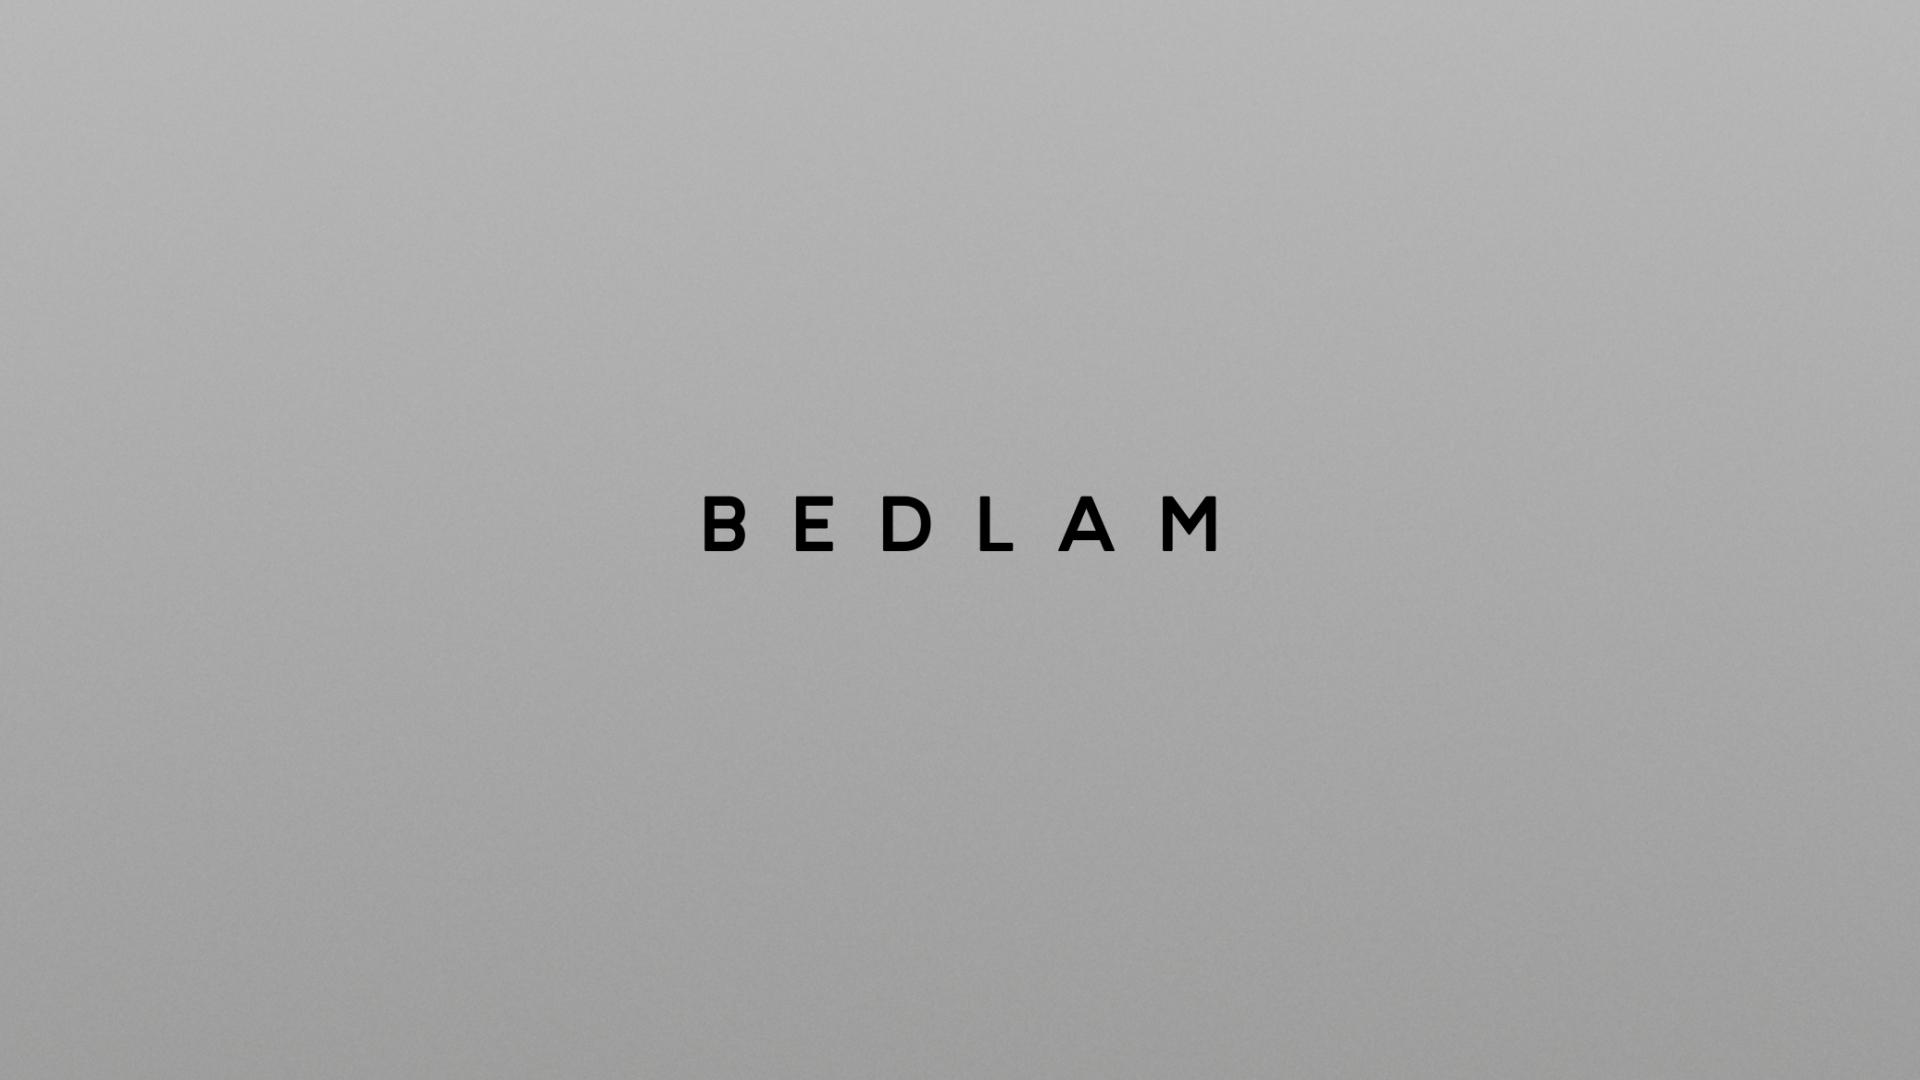 BEDLAM_TITLE_V04_HQ (0-00-11-09).jpg